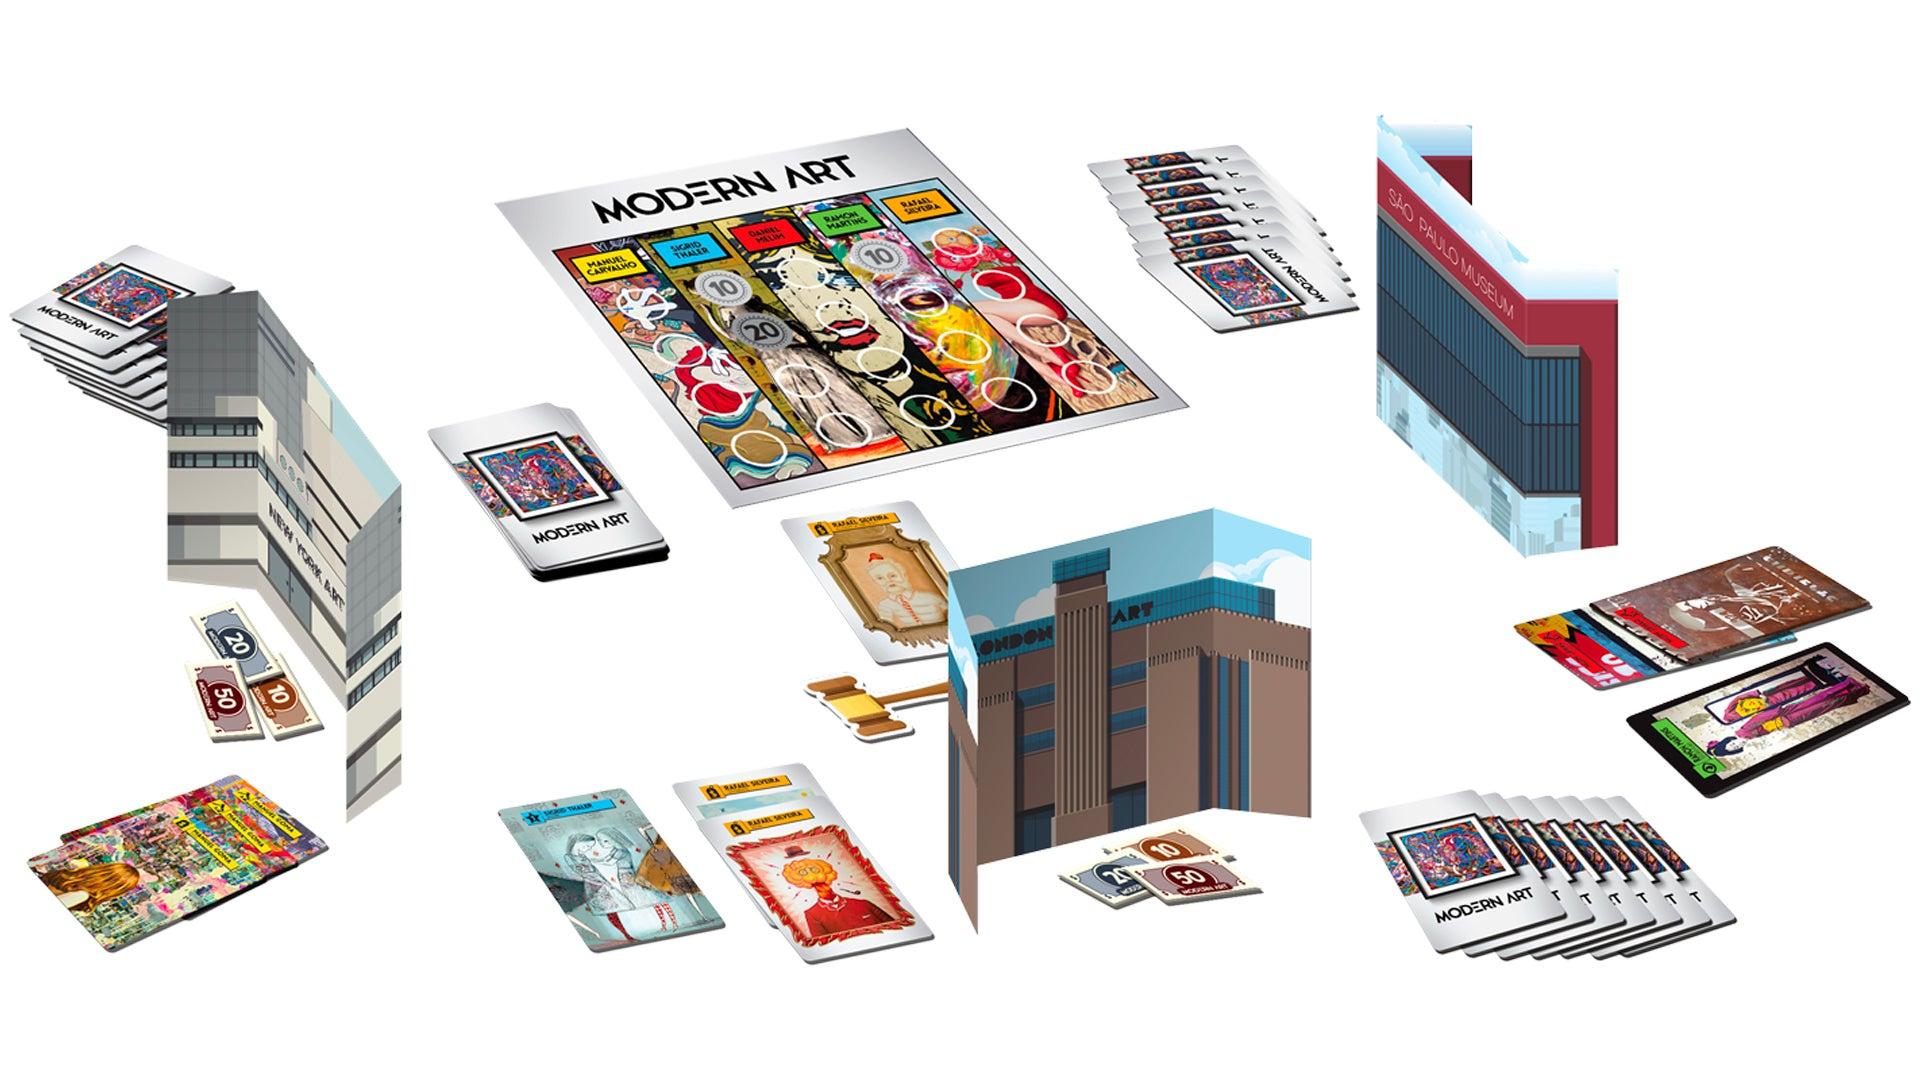 modern-art-board-game-gameplay-layout.jpg